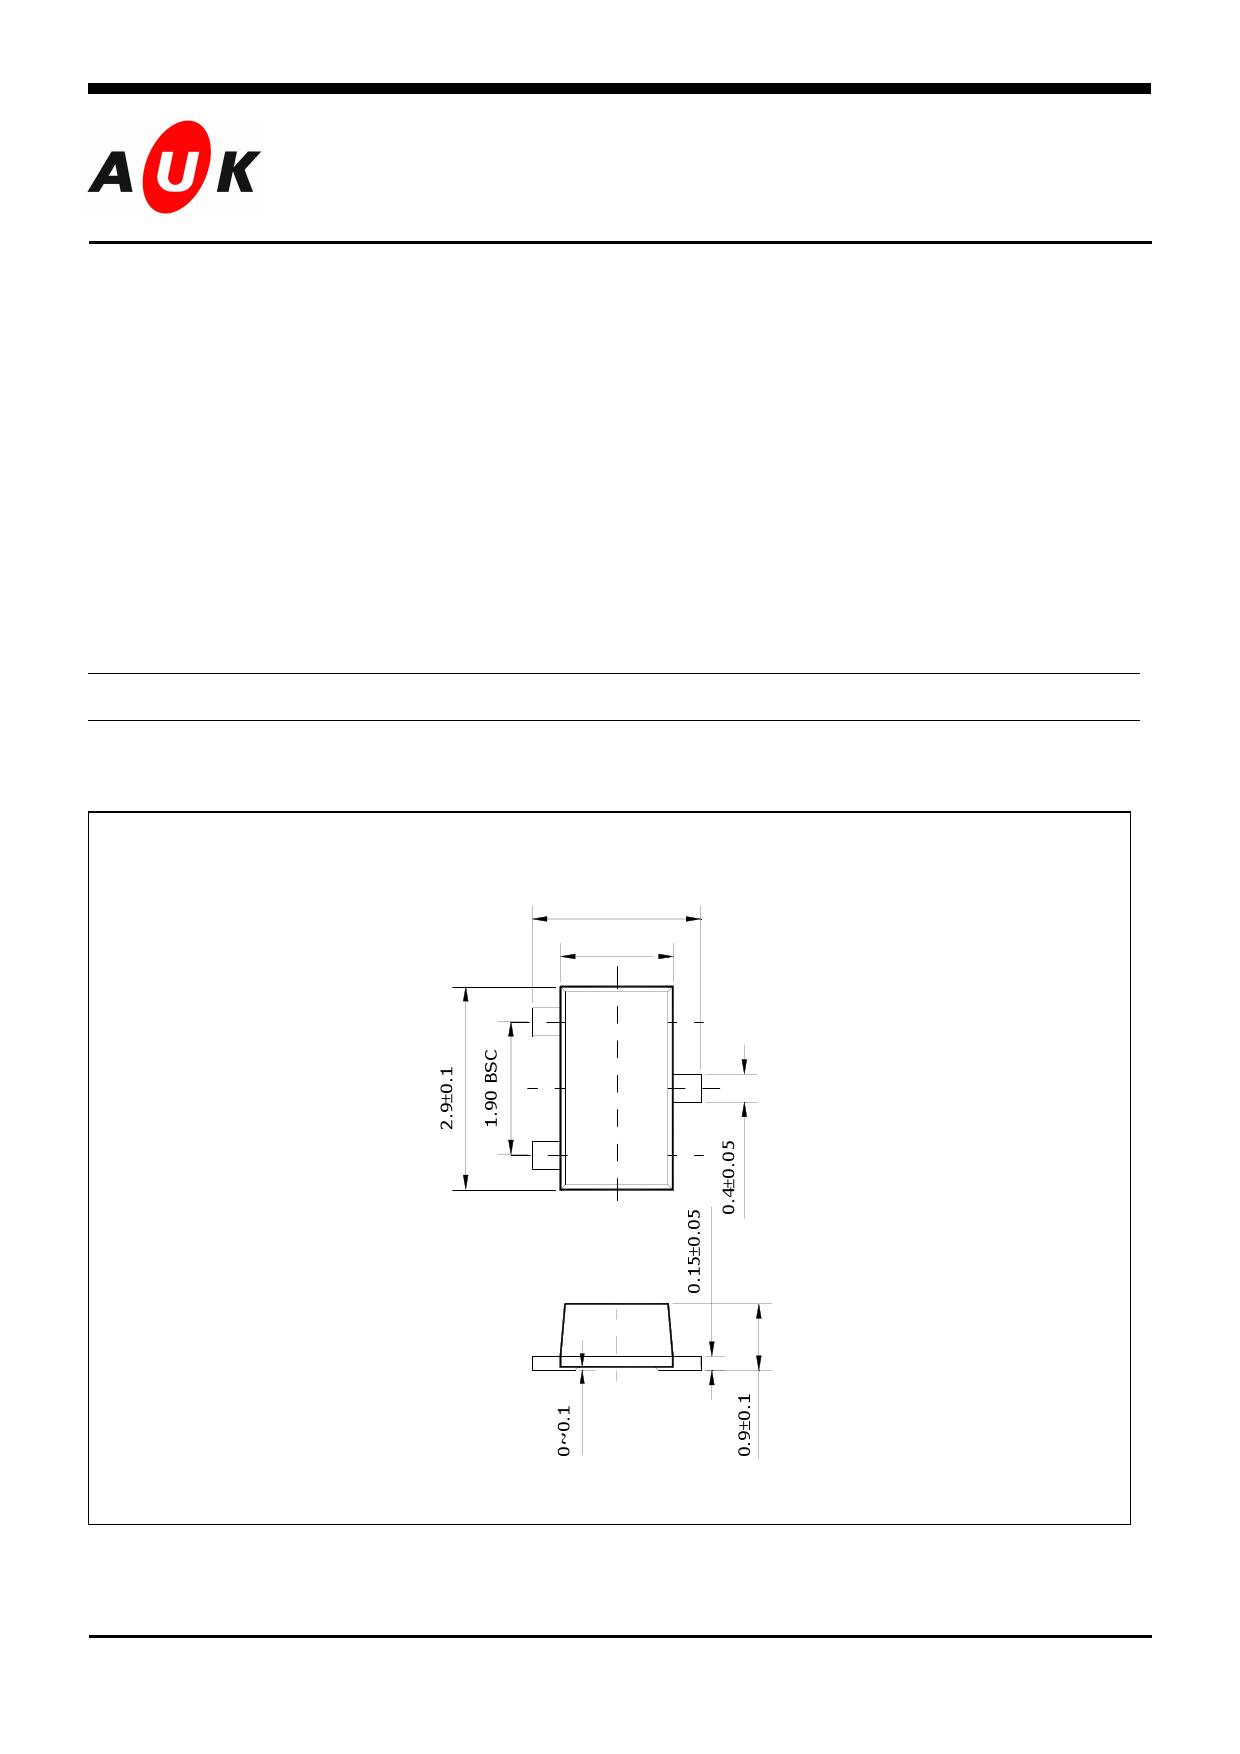 SBT42F image